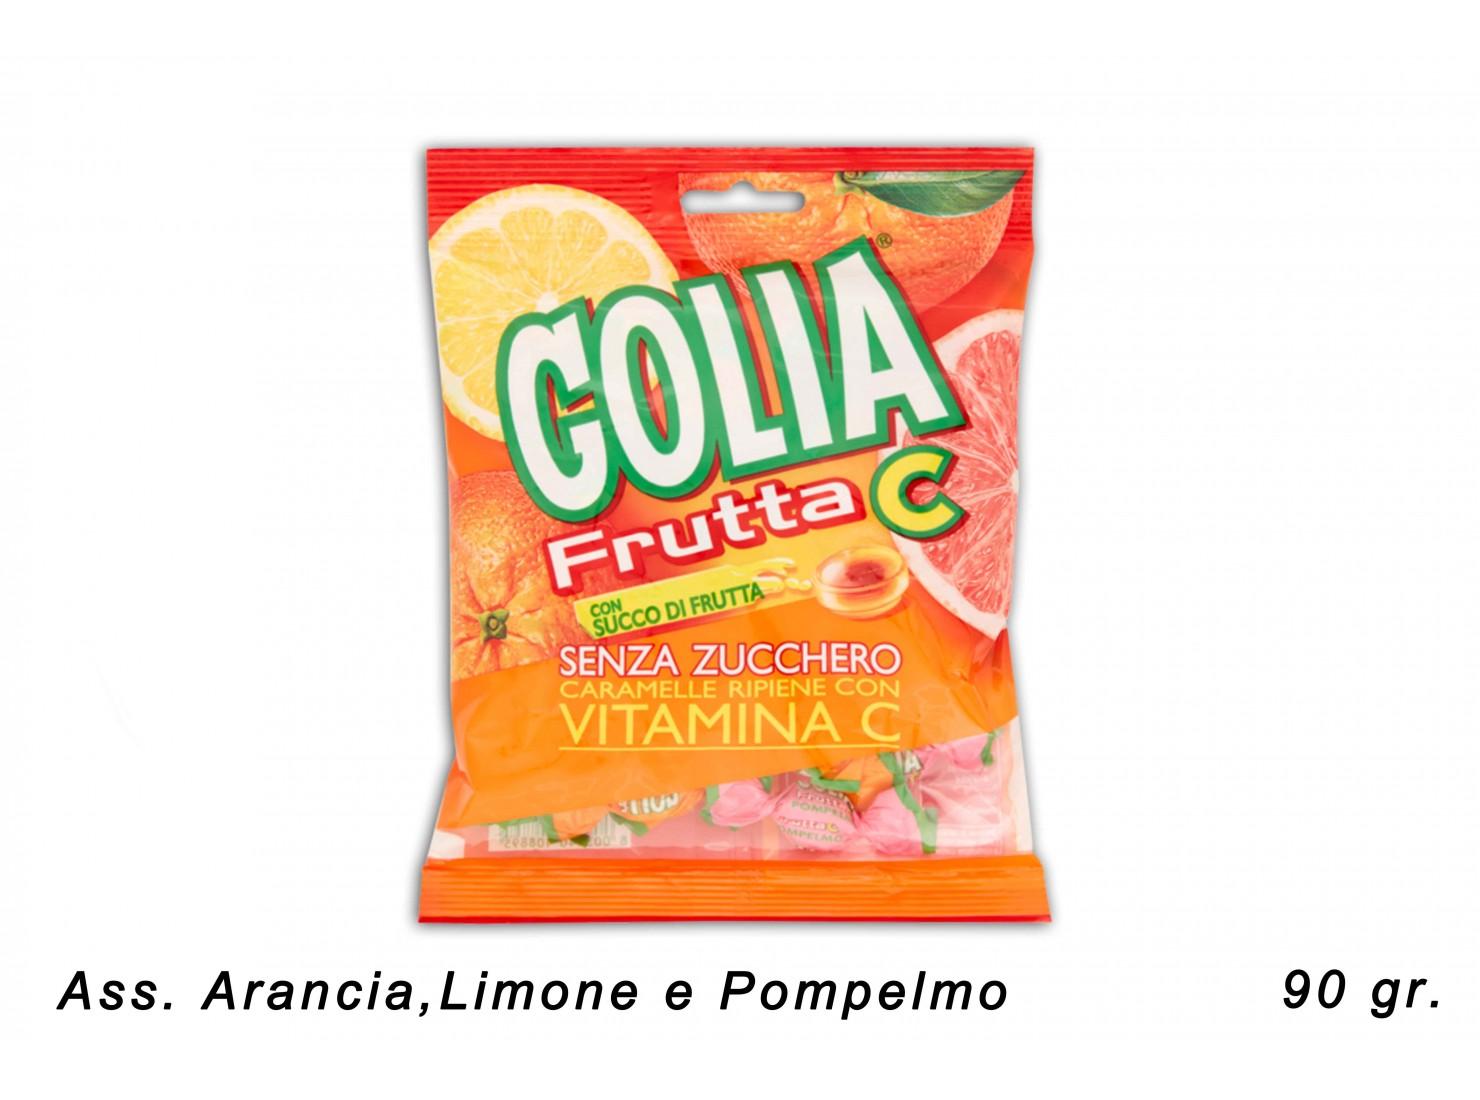 GOLIA FRUTTA C 90 GR